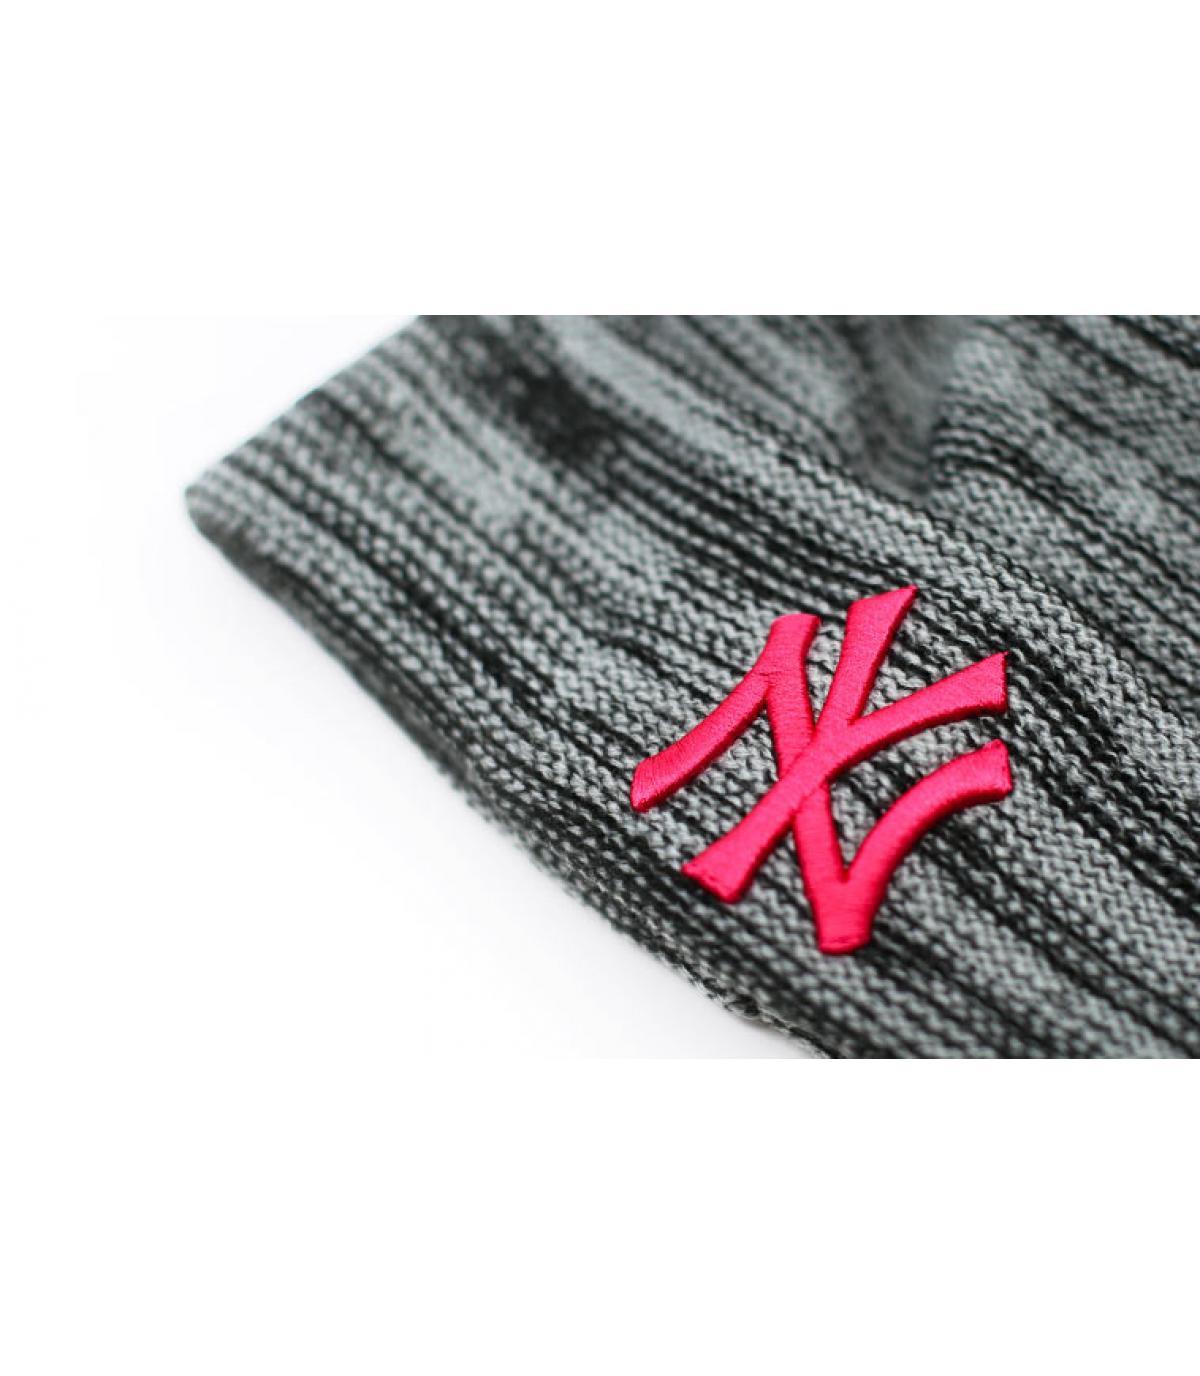 Détails Bonnet Wmns NY Marl Knit gray beetroot - image 3